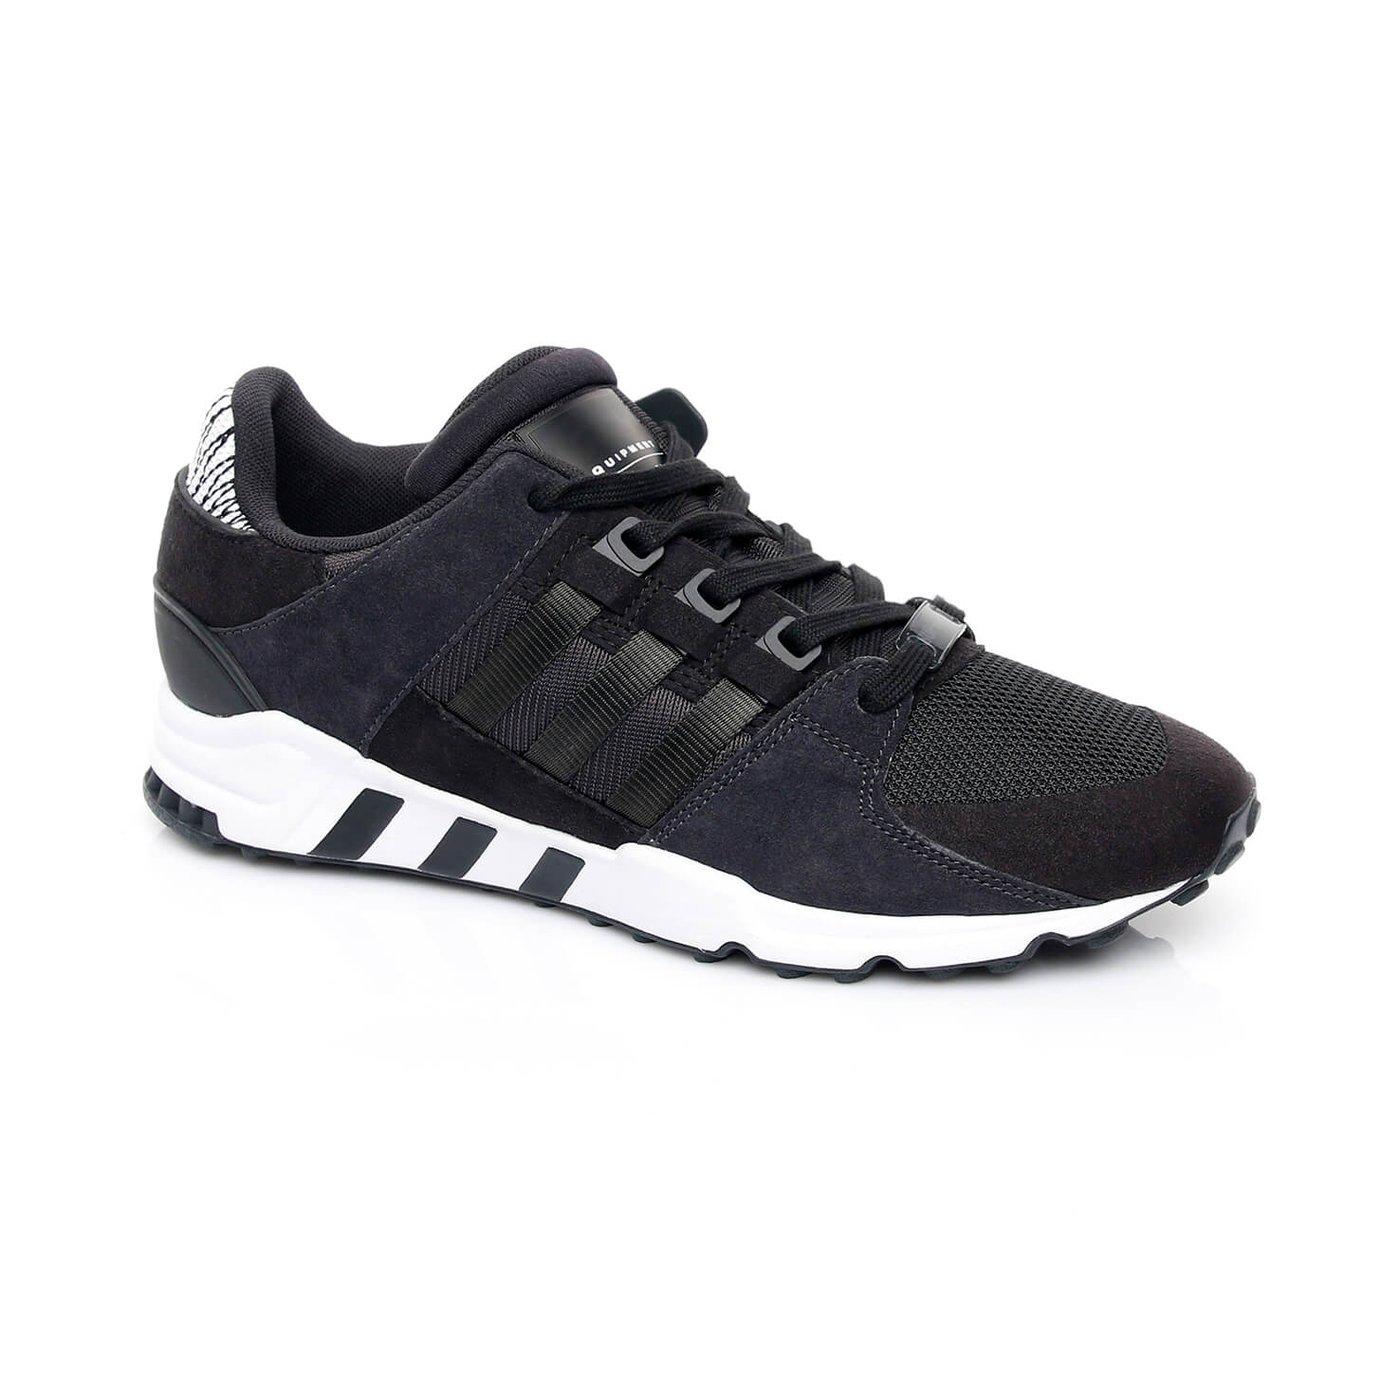 adidas Eqt Support Erkek Siyah Spor Ayakkabı